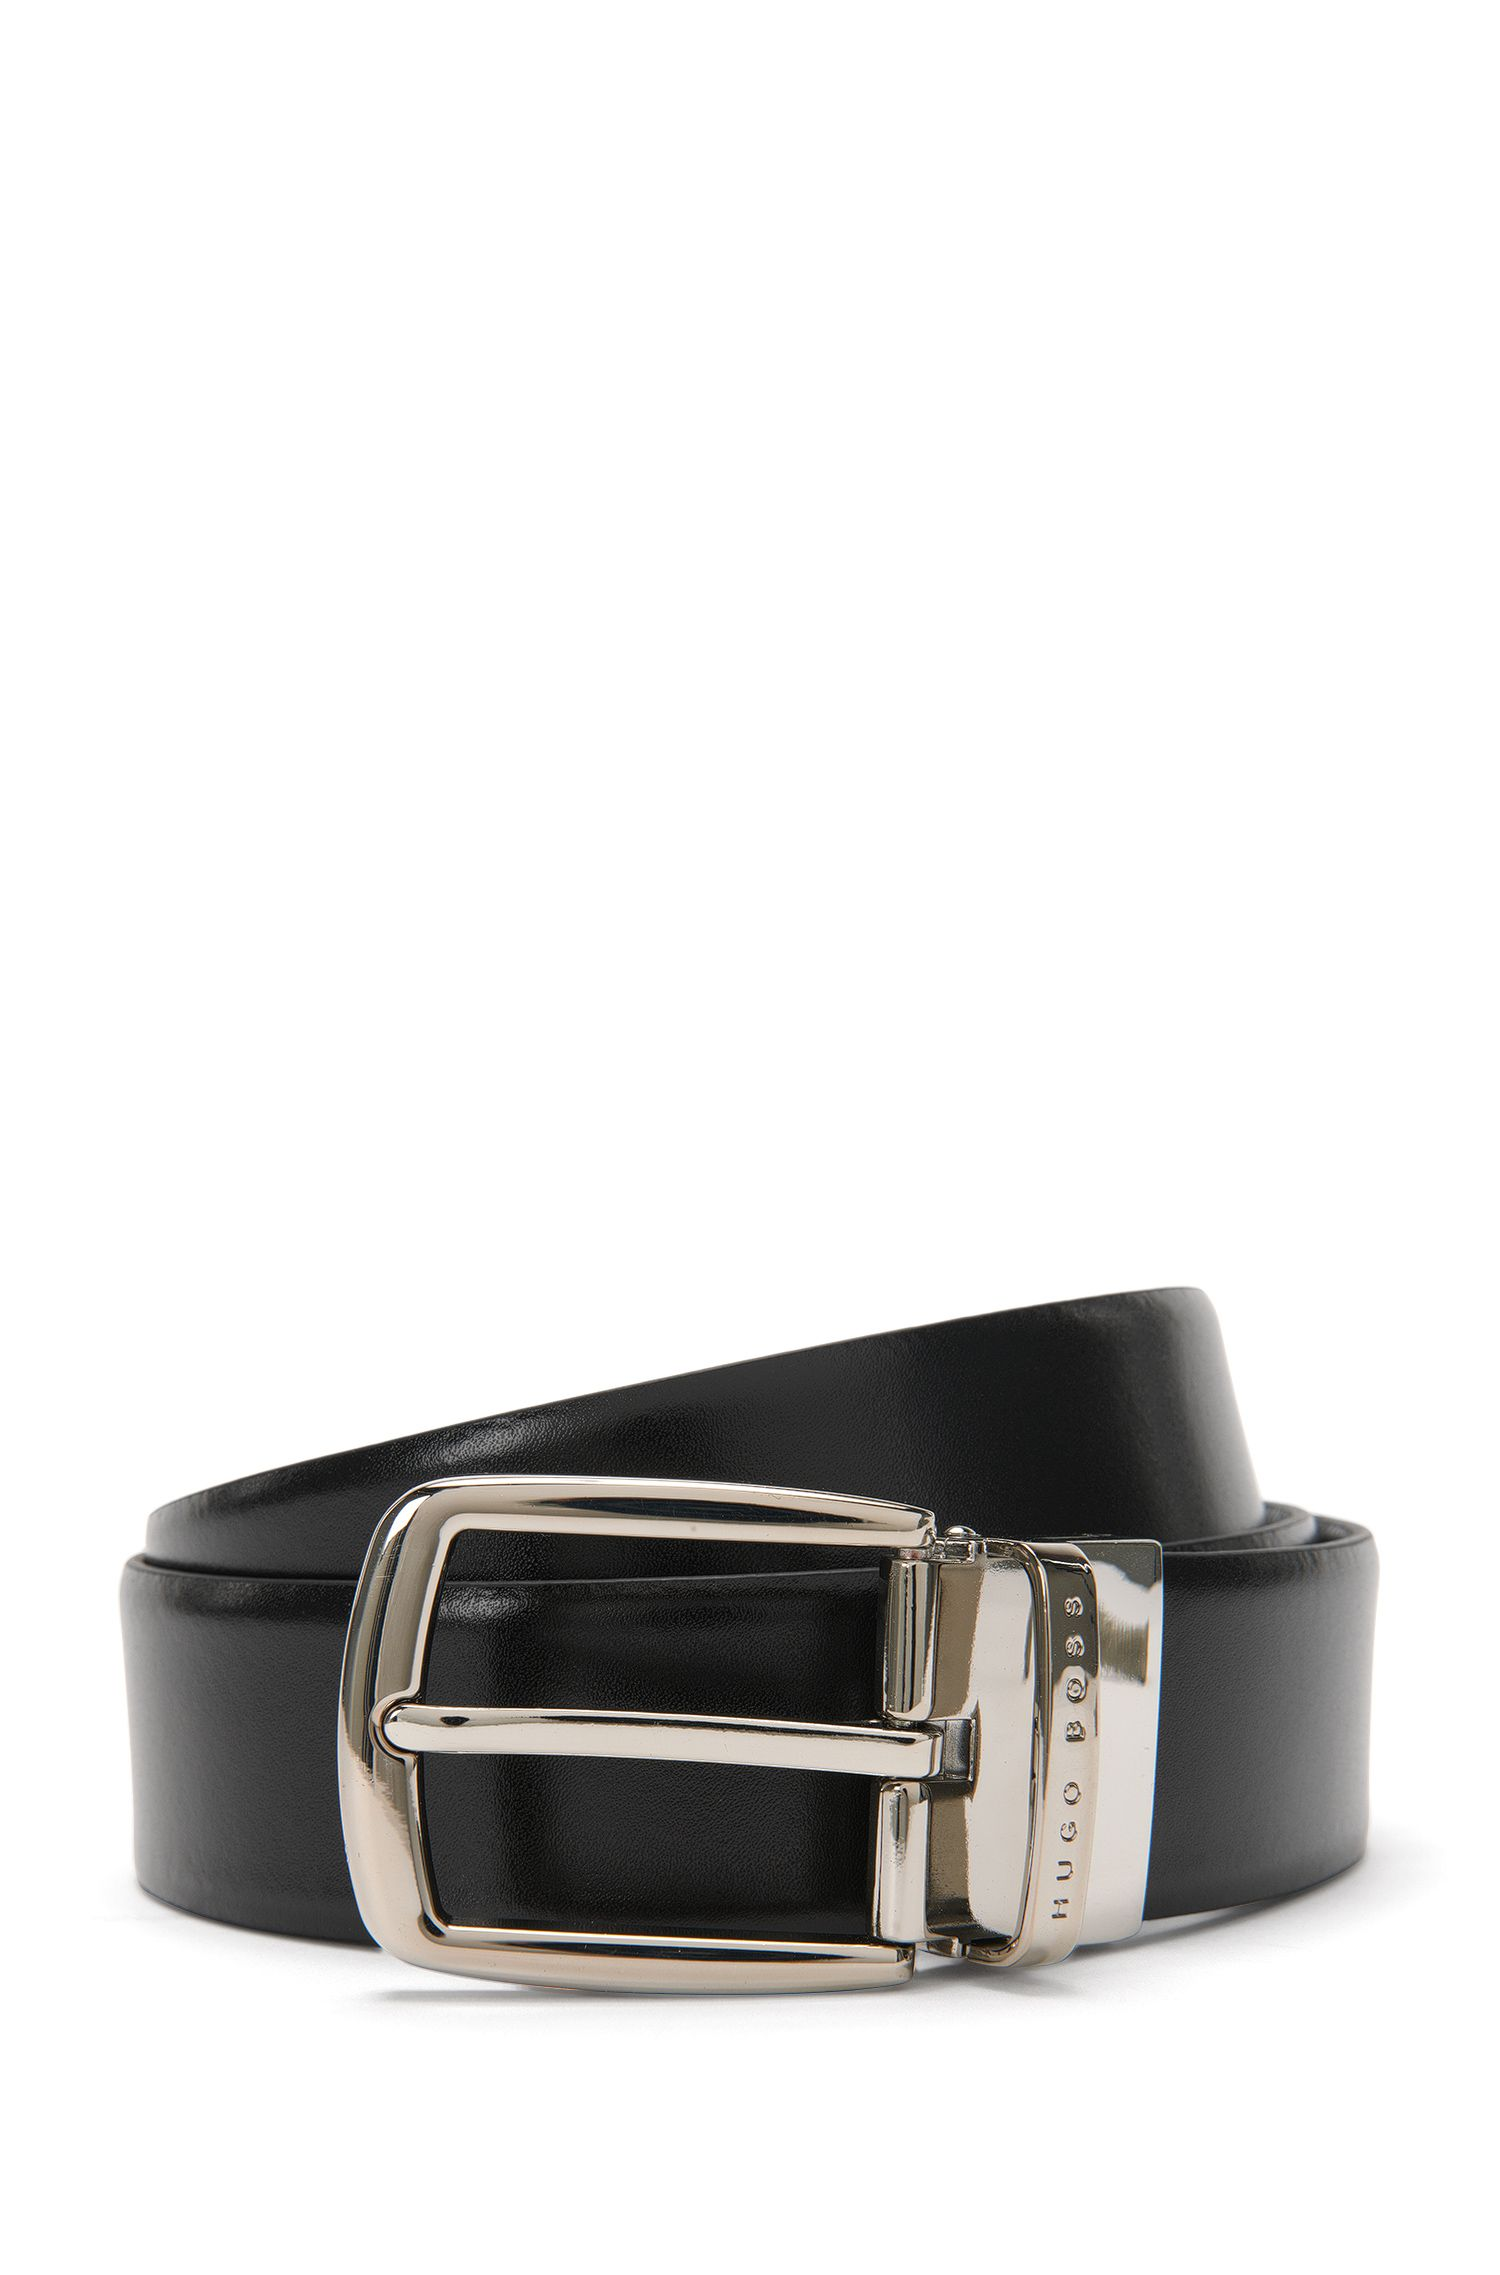 'Ofer Or35 Ps' | Leather Handmade Reversible Belt